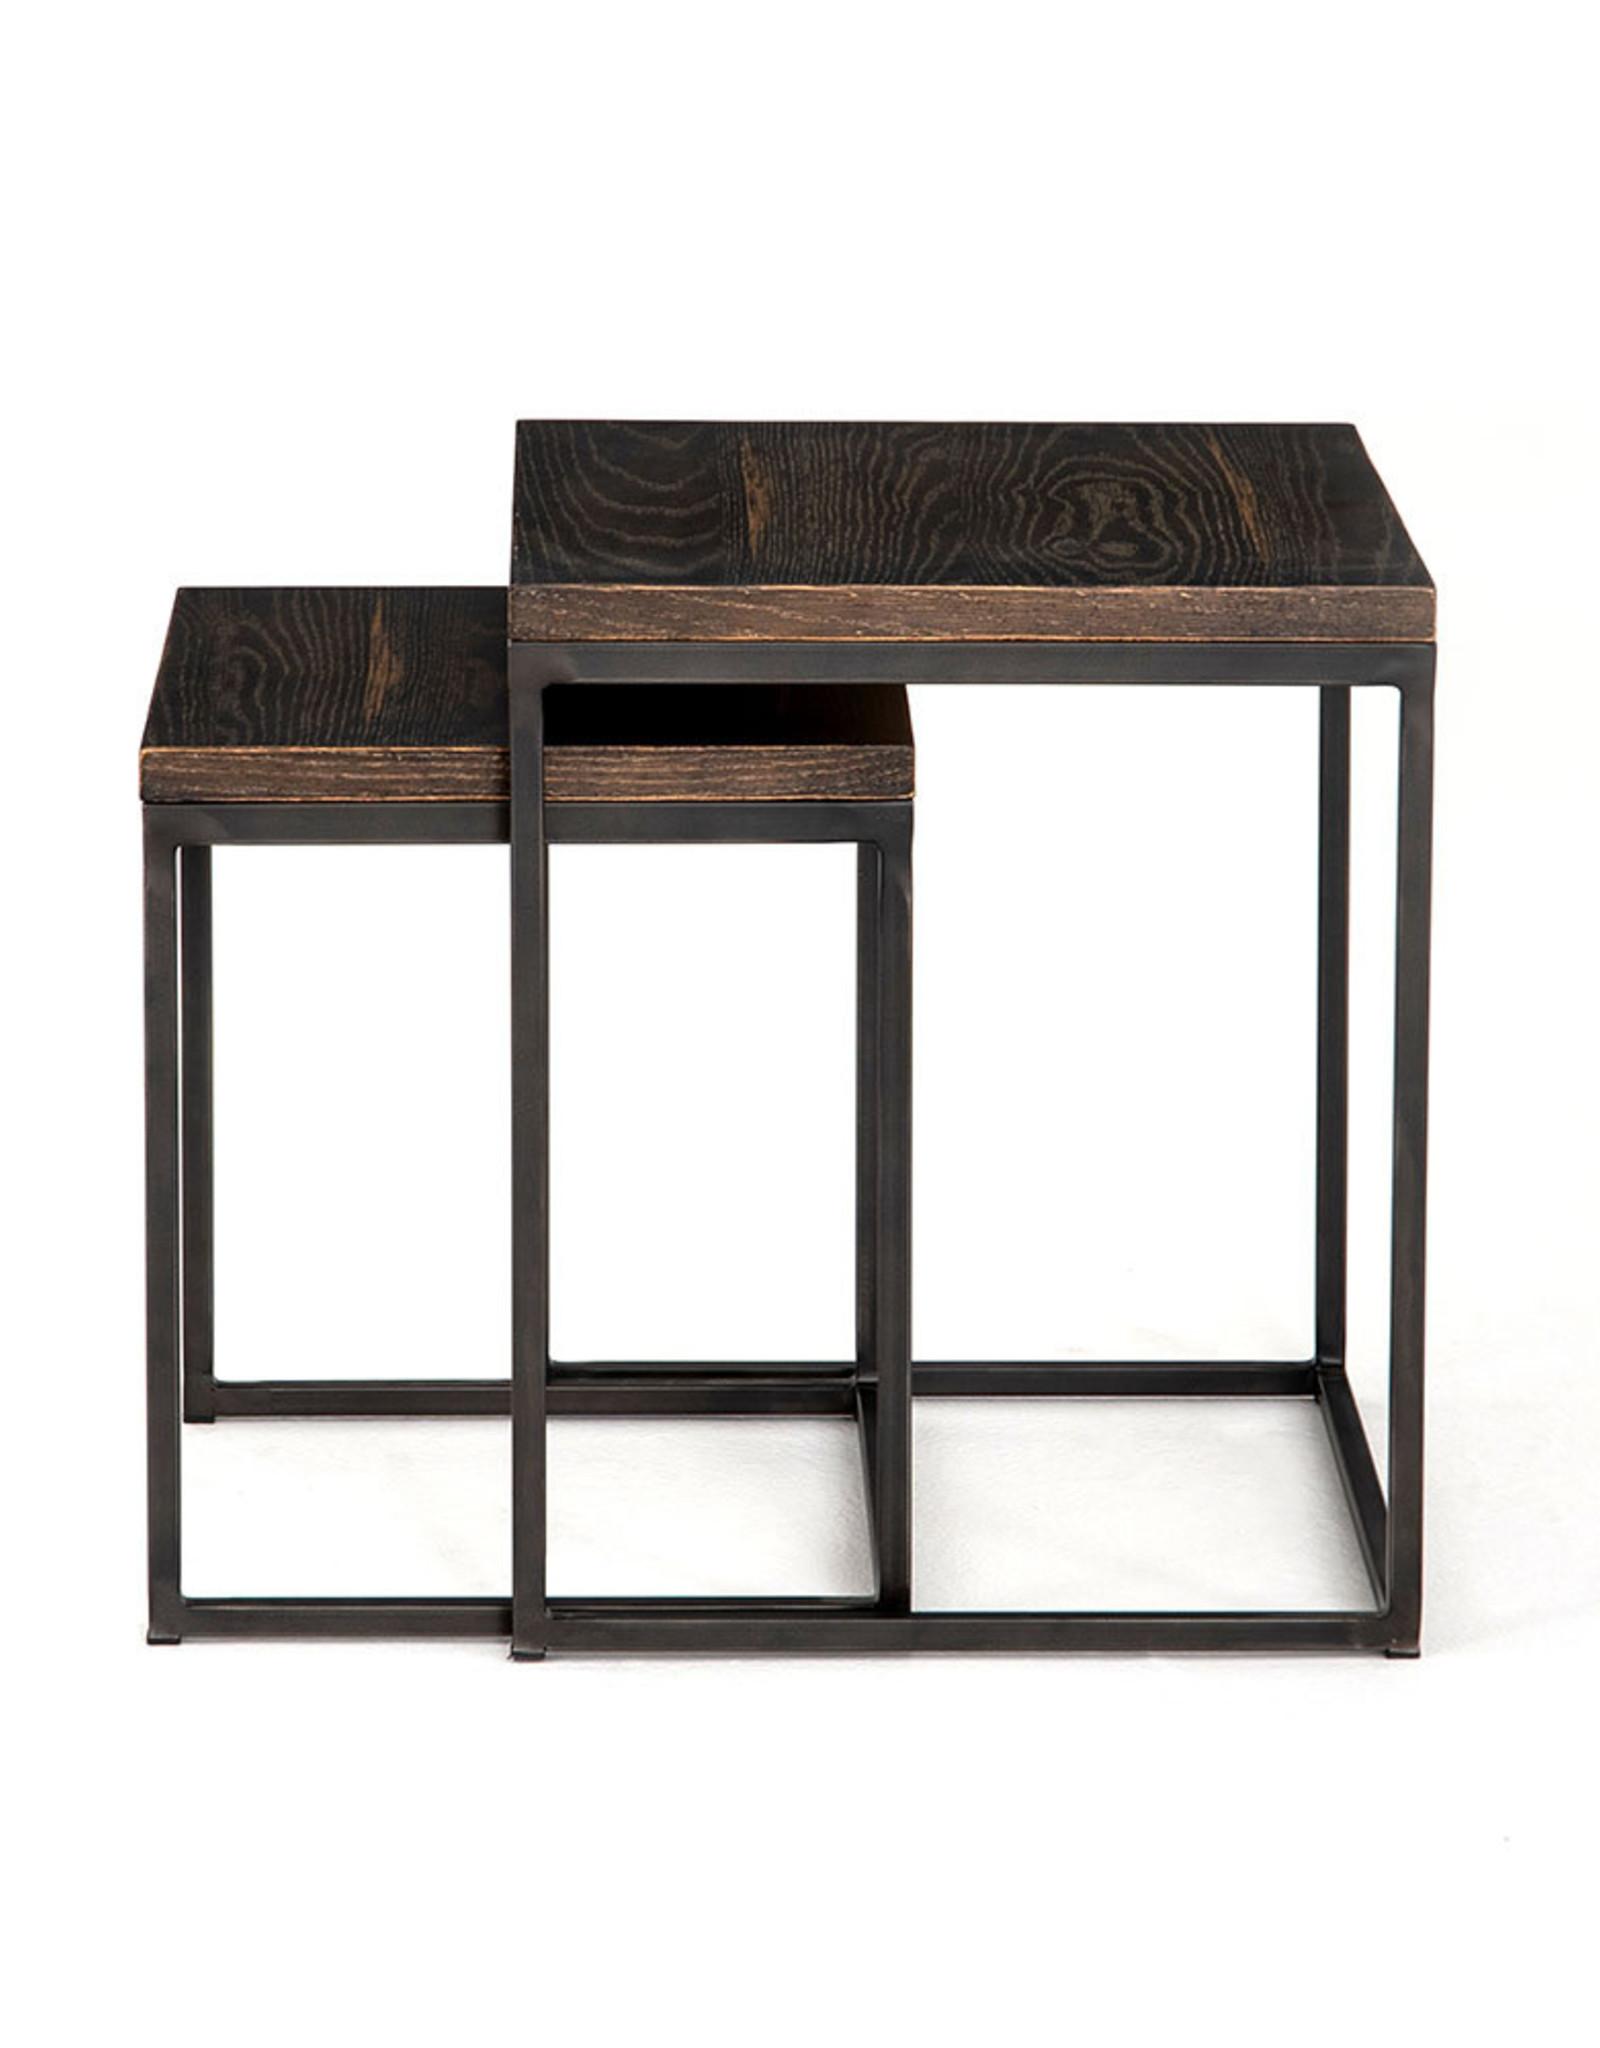 Harlow English Brown Oak Side Table - Large